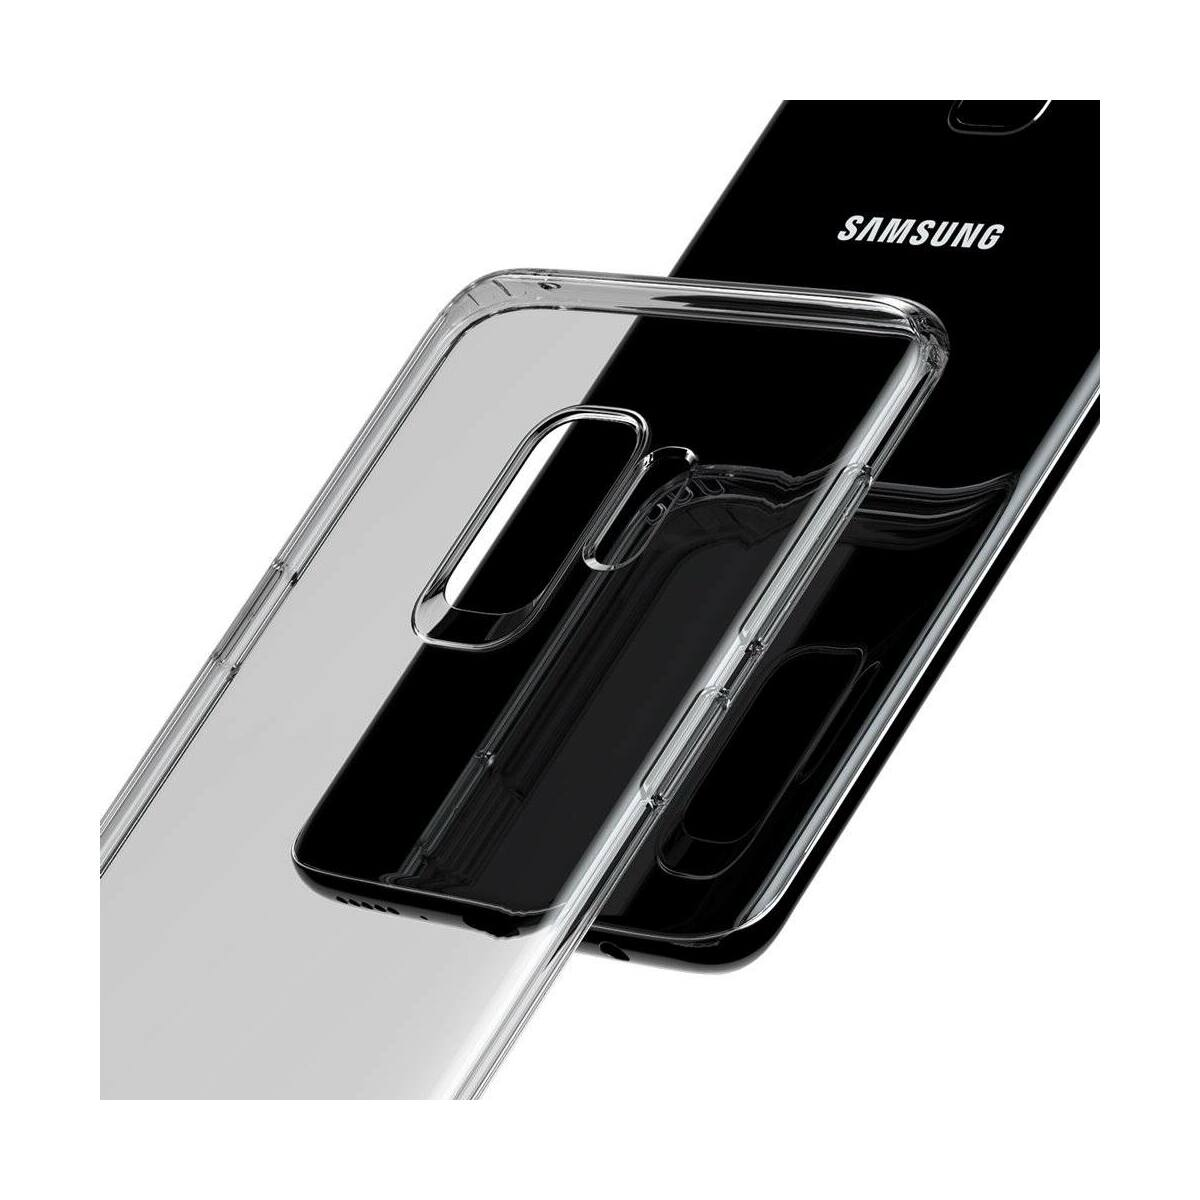 Baseus Samsung Galaxy S9 tok, TPU, fekete (ARSAS9-01)